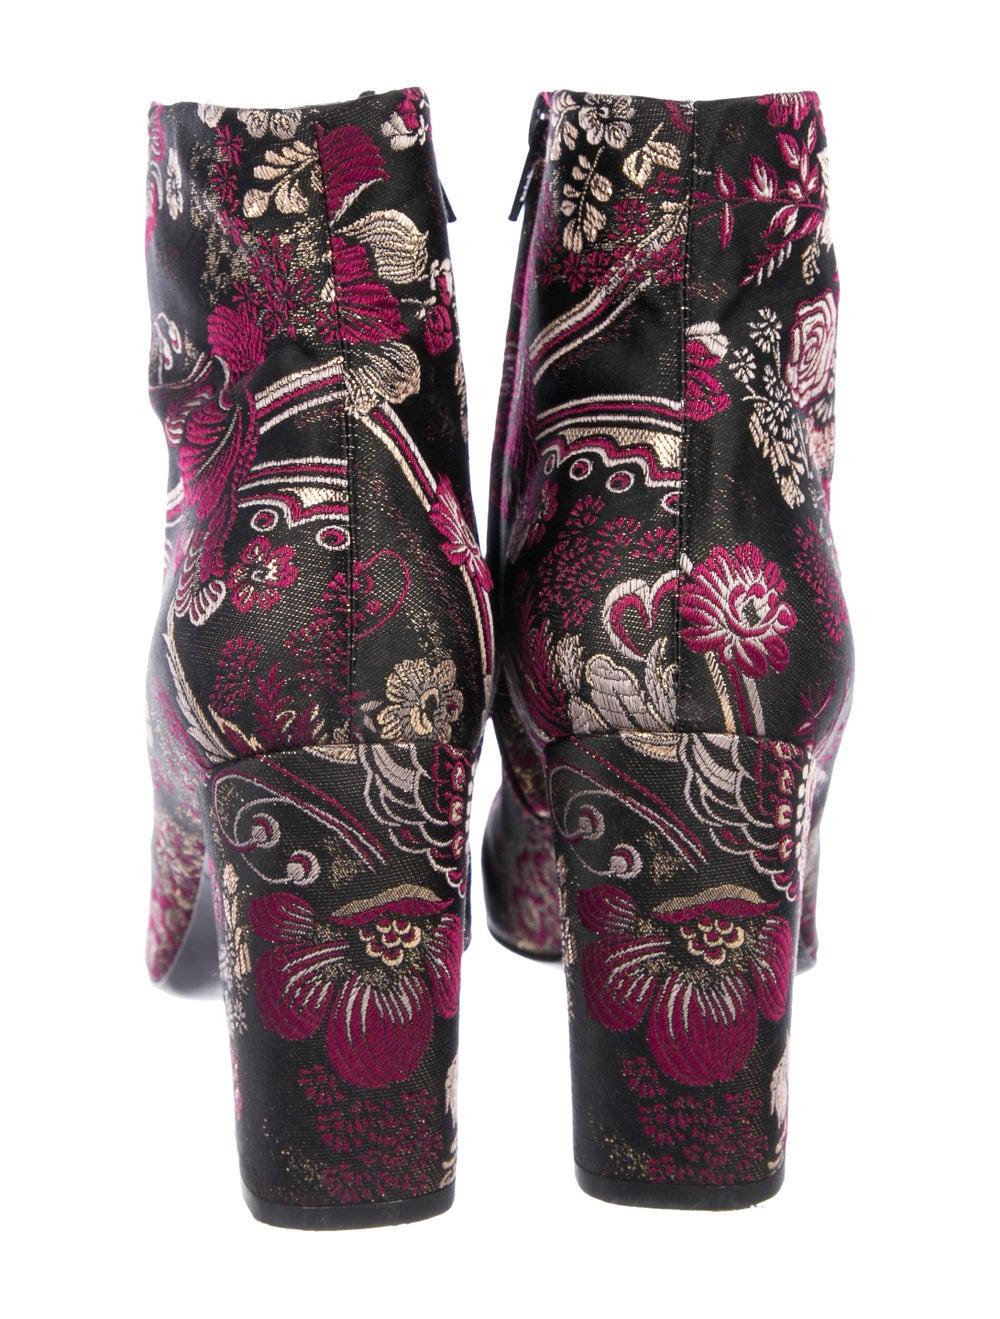 Saint Laurent Brocade Ankle Boots Pink - image 4